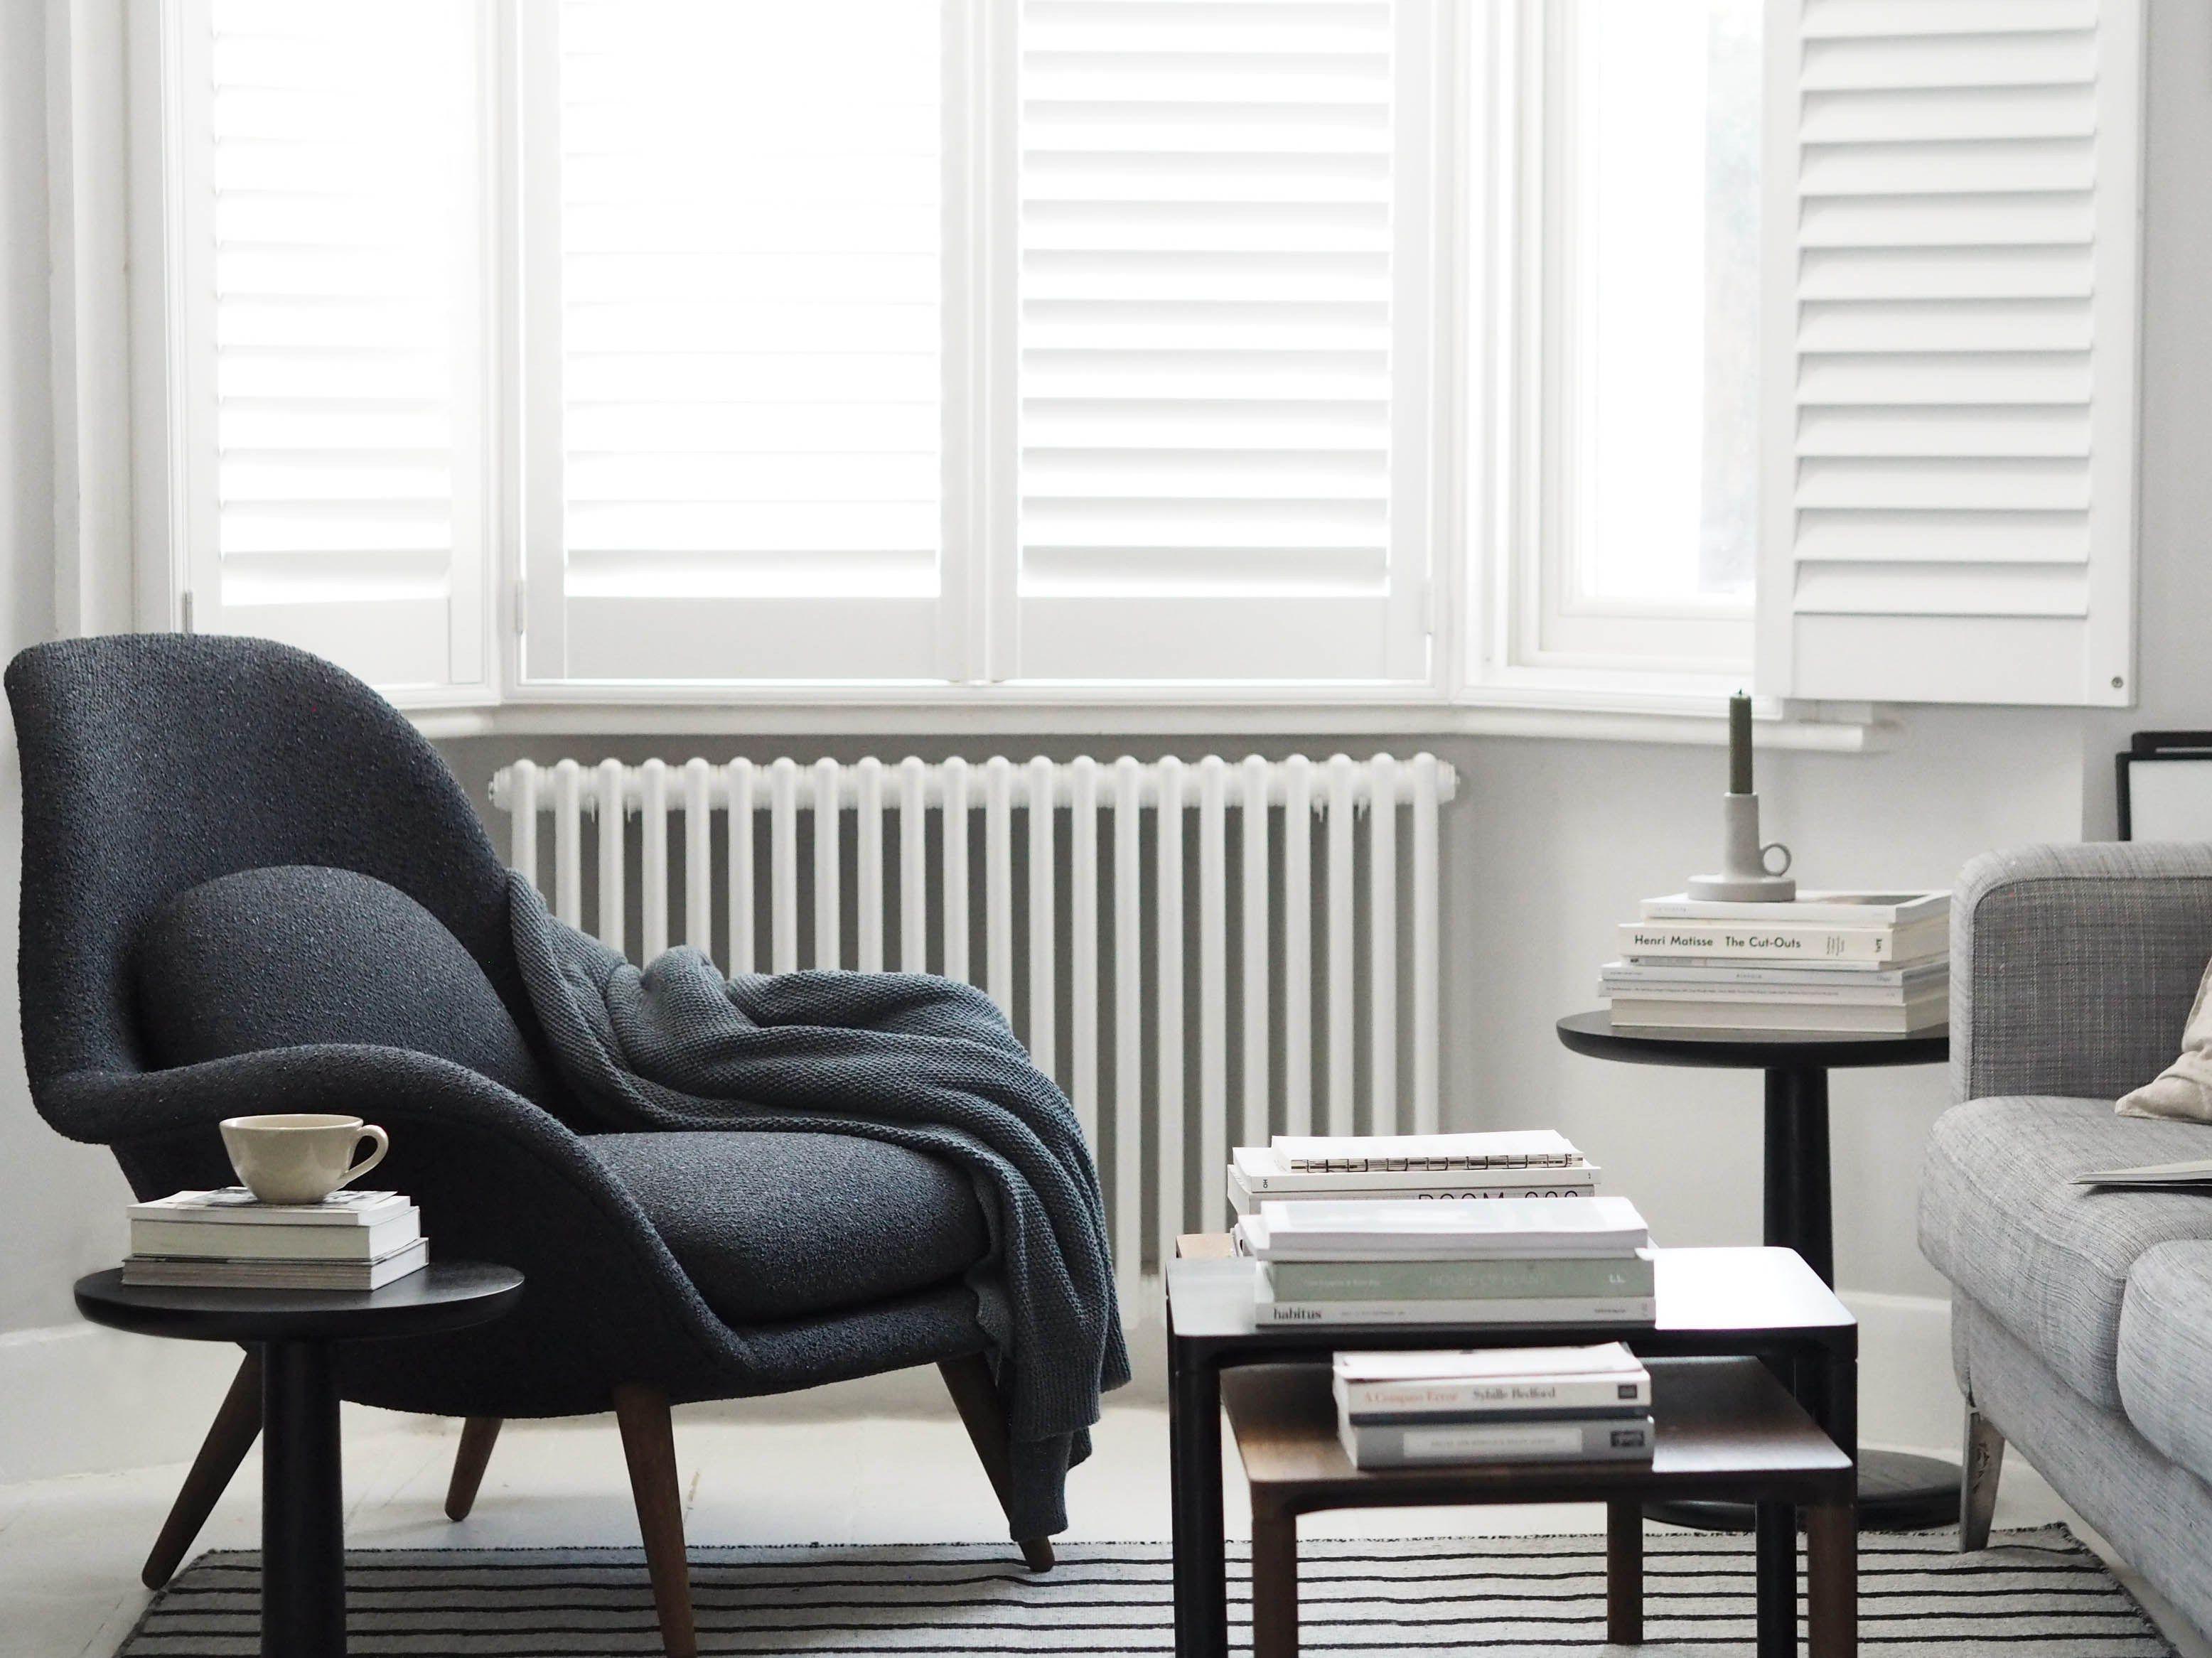 Fredericia furniture The Modern Originals of tomorrow